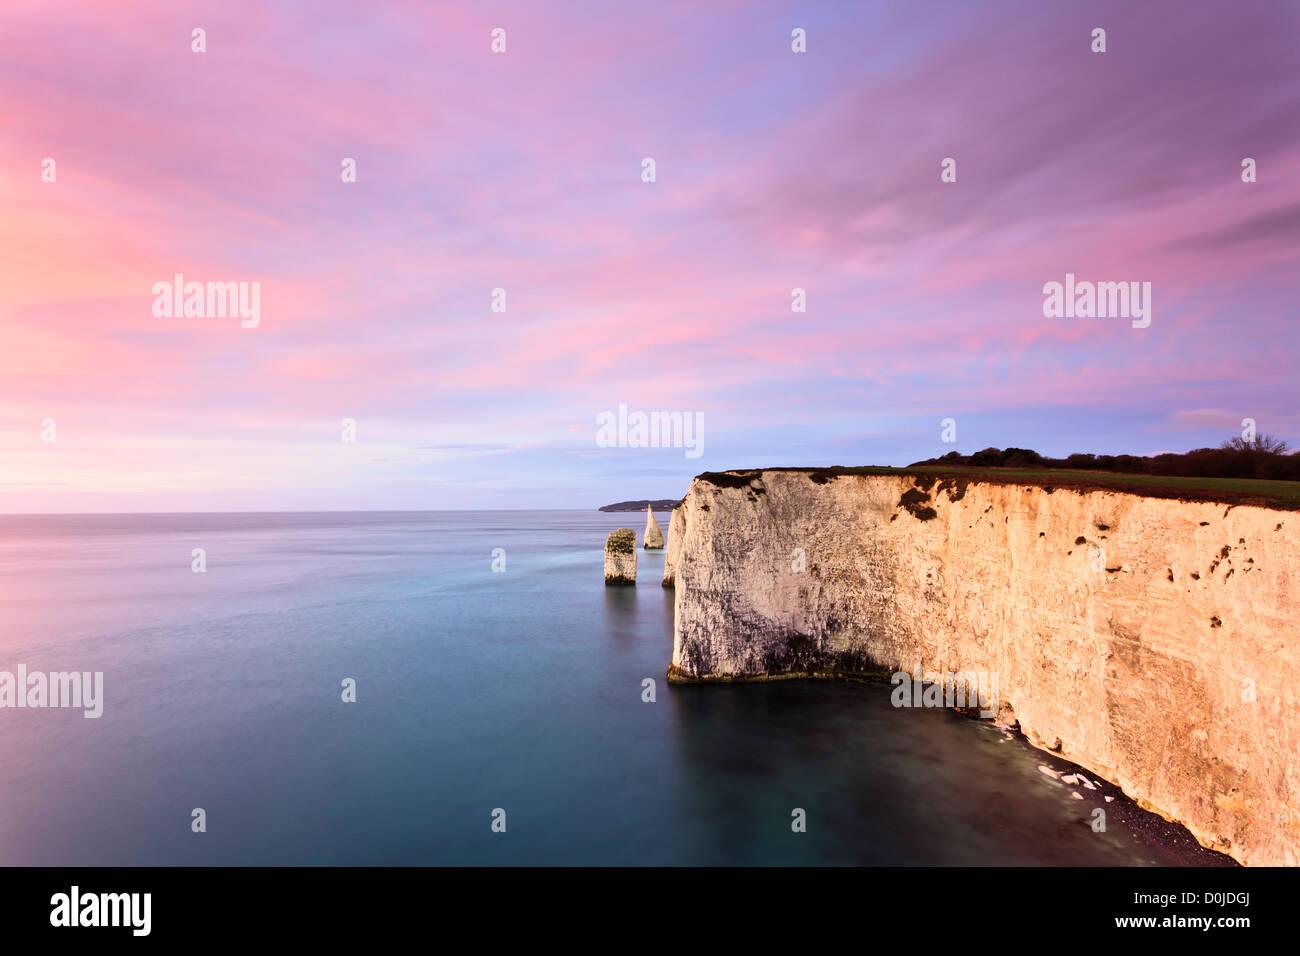 A view toward The Pinnacles on the Dorset coast. - Stock Image